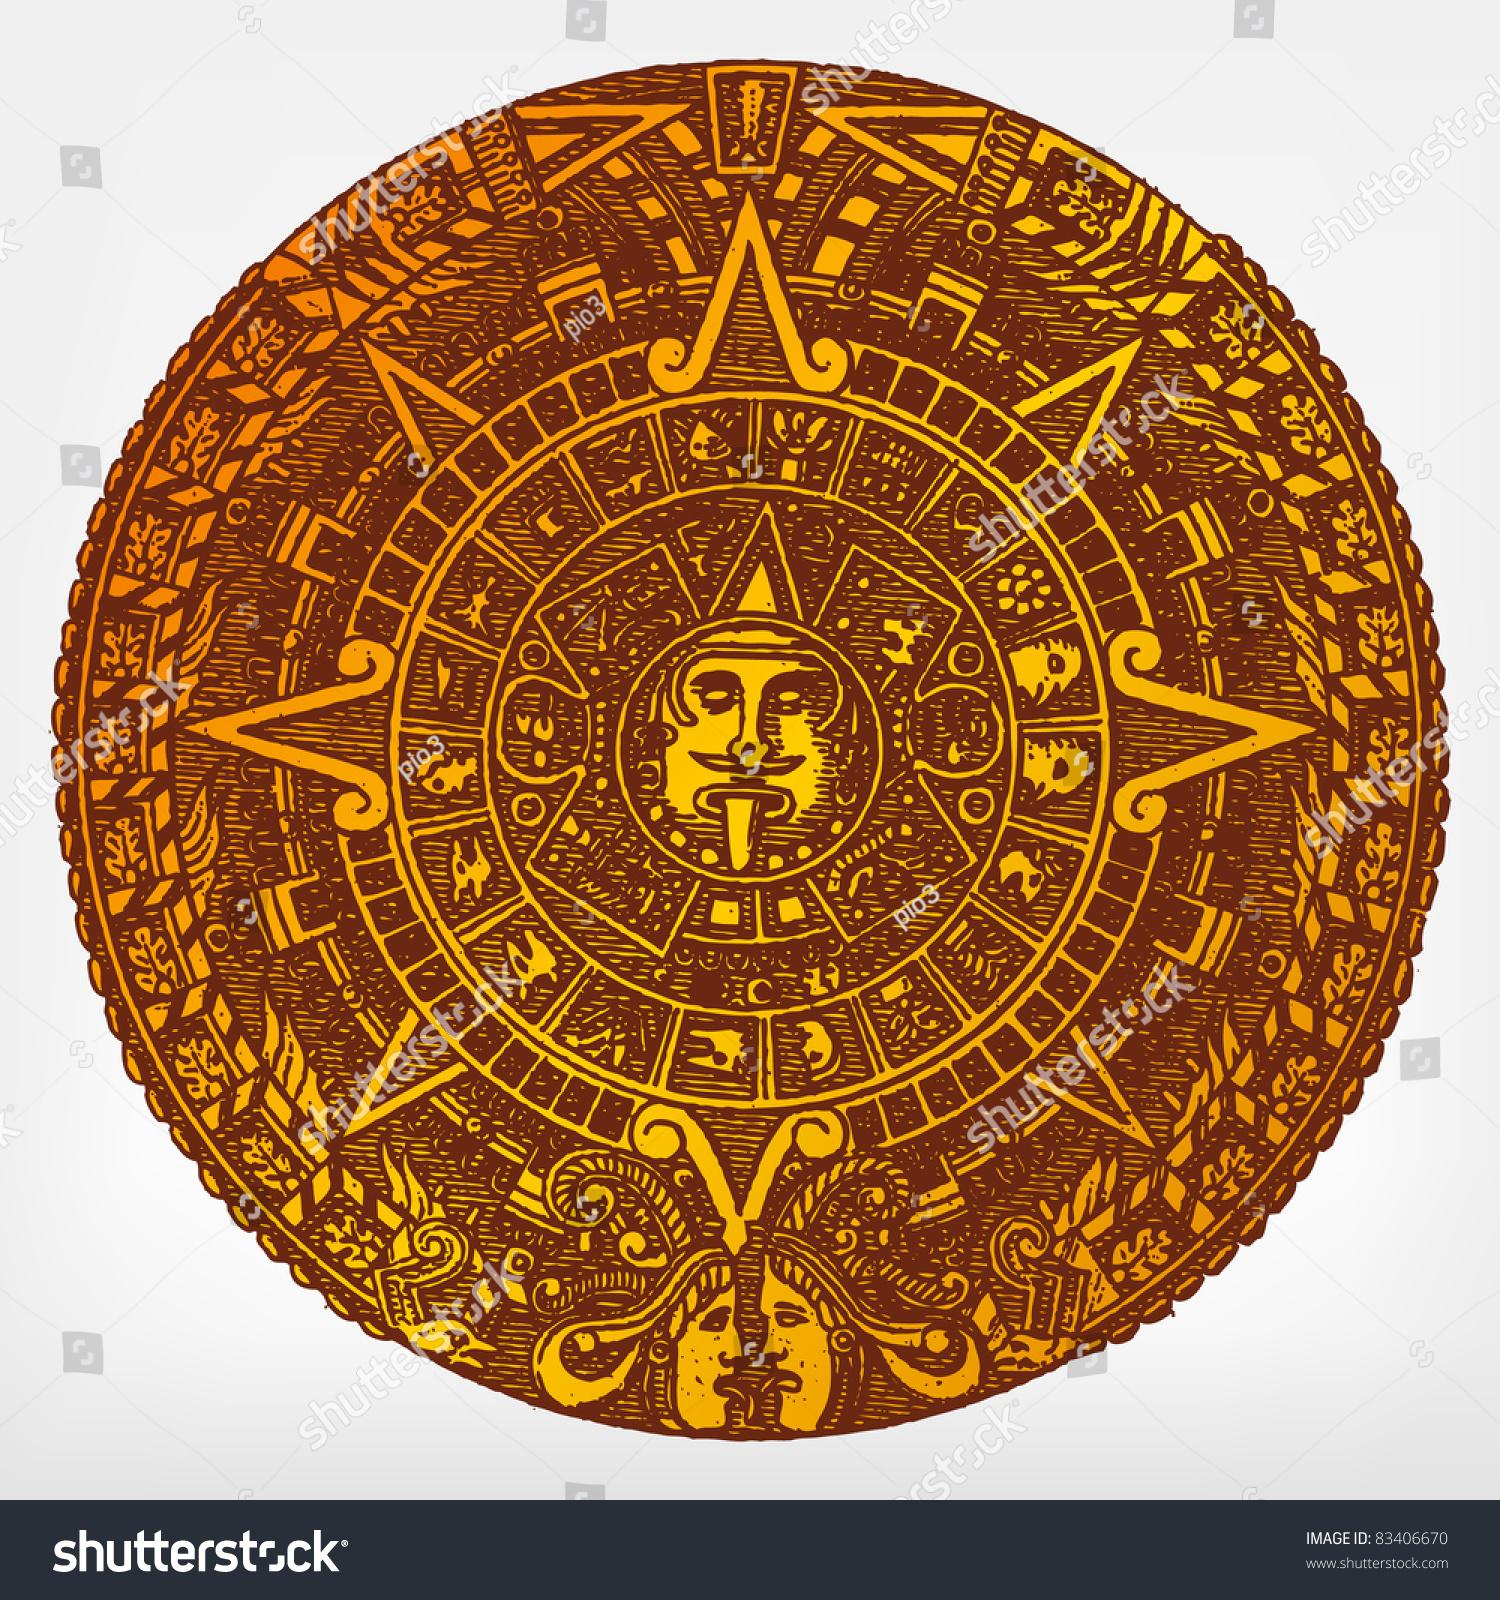 Mayan Calendar Vector Art : Engraving vintage maya calendar the complete stock vector